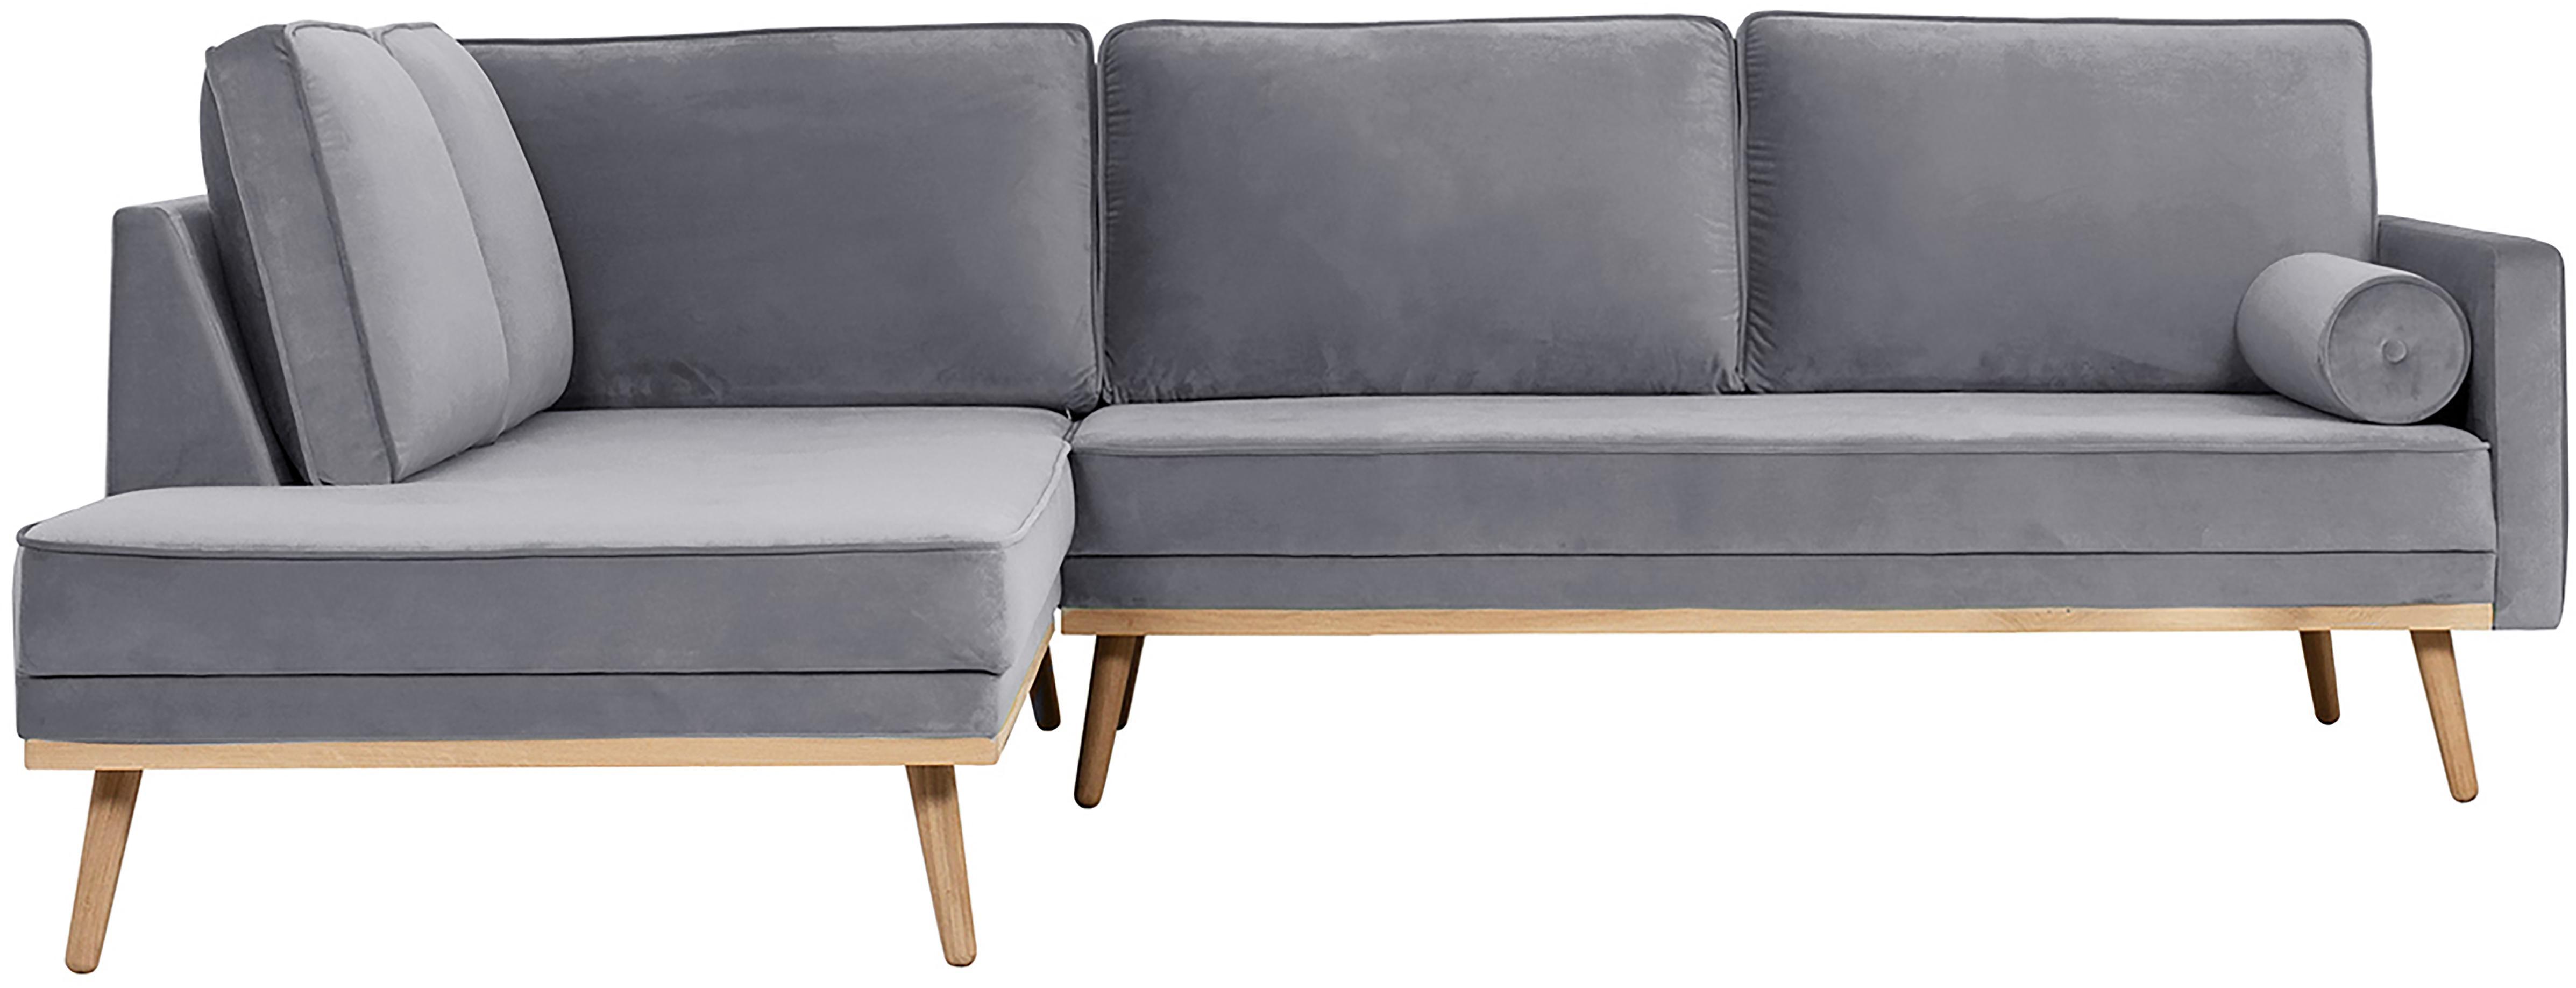 Fluwelen hoekbank Saint (3-zits), Bekleding: fluweel (polyester), Frame: massief eikenhout, spaanp, Grijs, B 243 x D 220 cm